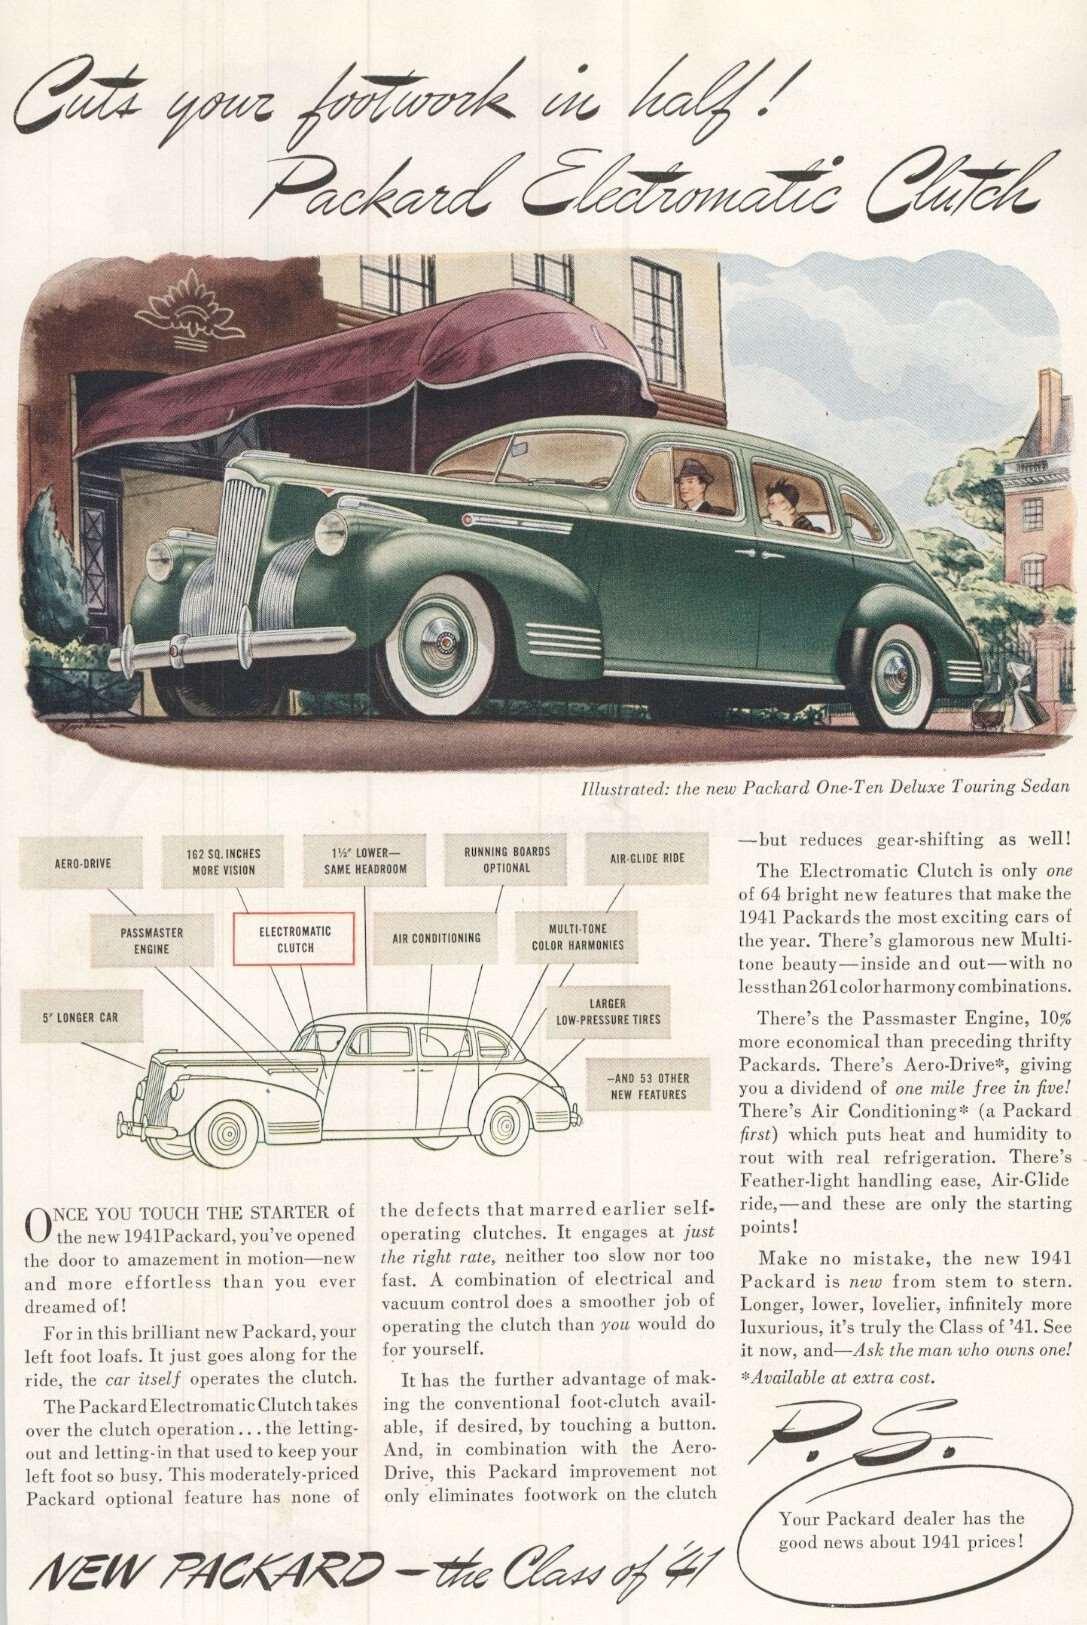 1941 One-Ten Deluxe Touring Sedan